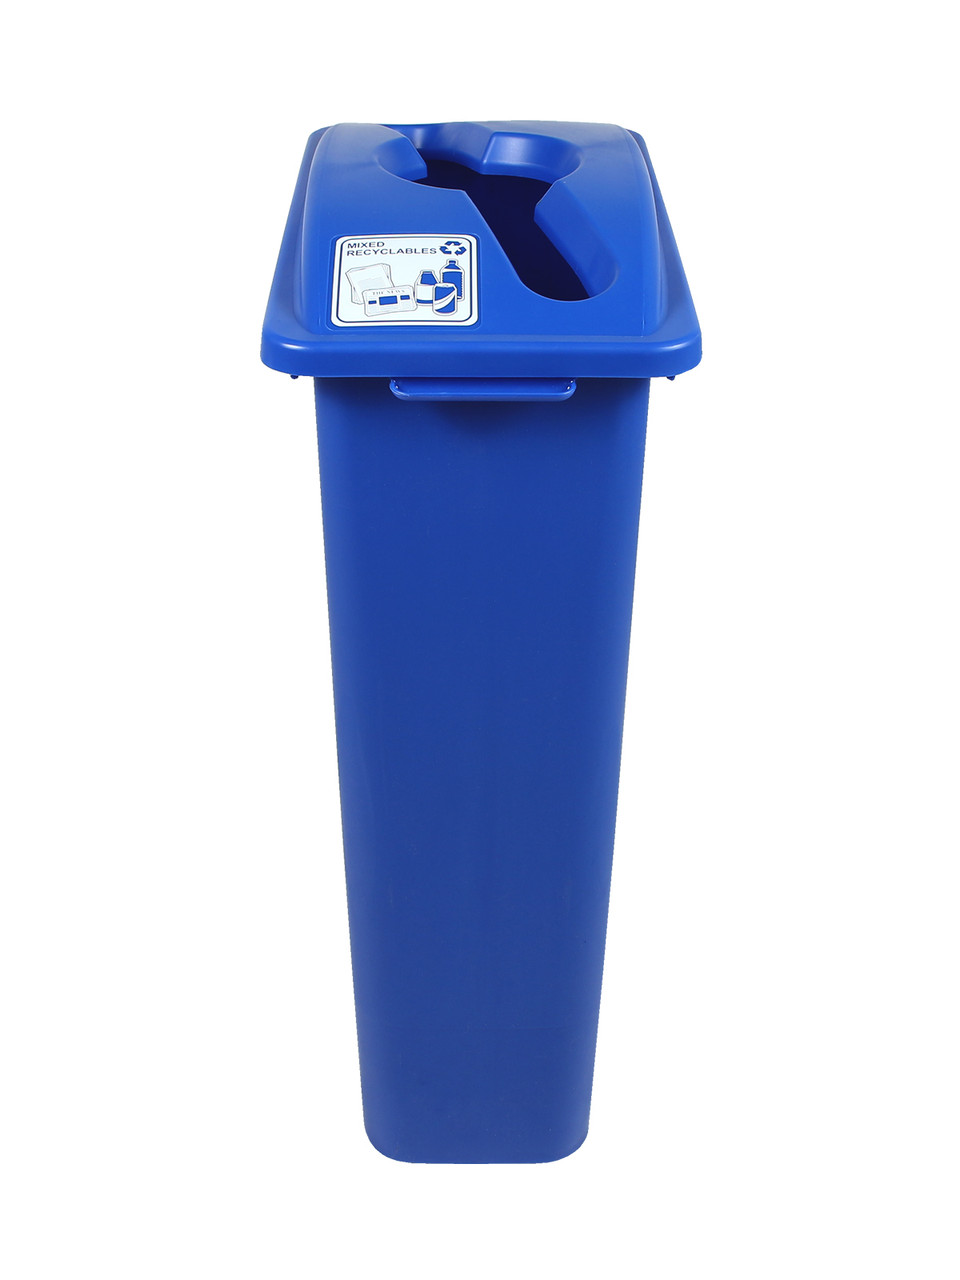 23 Gallon Blue Simple Sort Recycle Bin